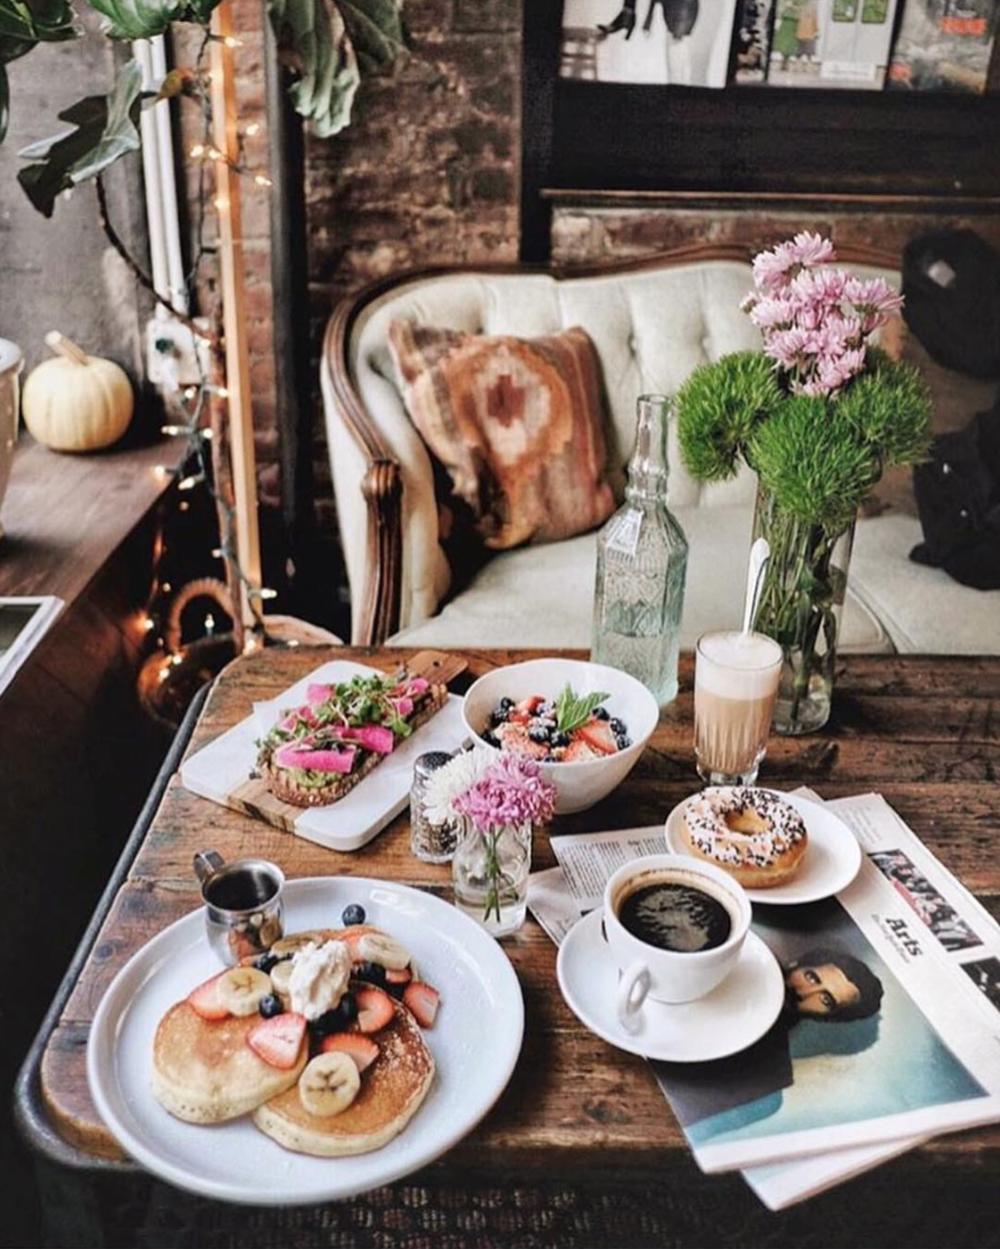 locali instagrammabili new york pancakes